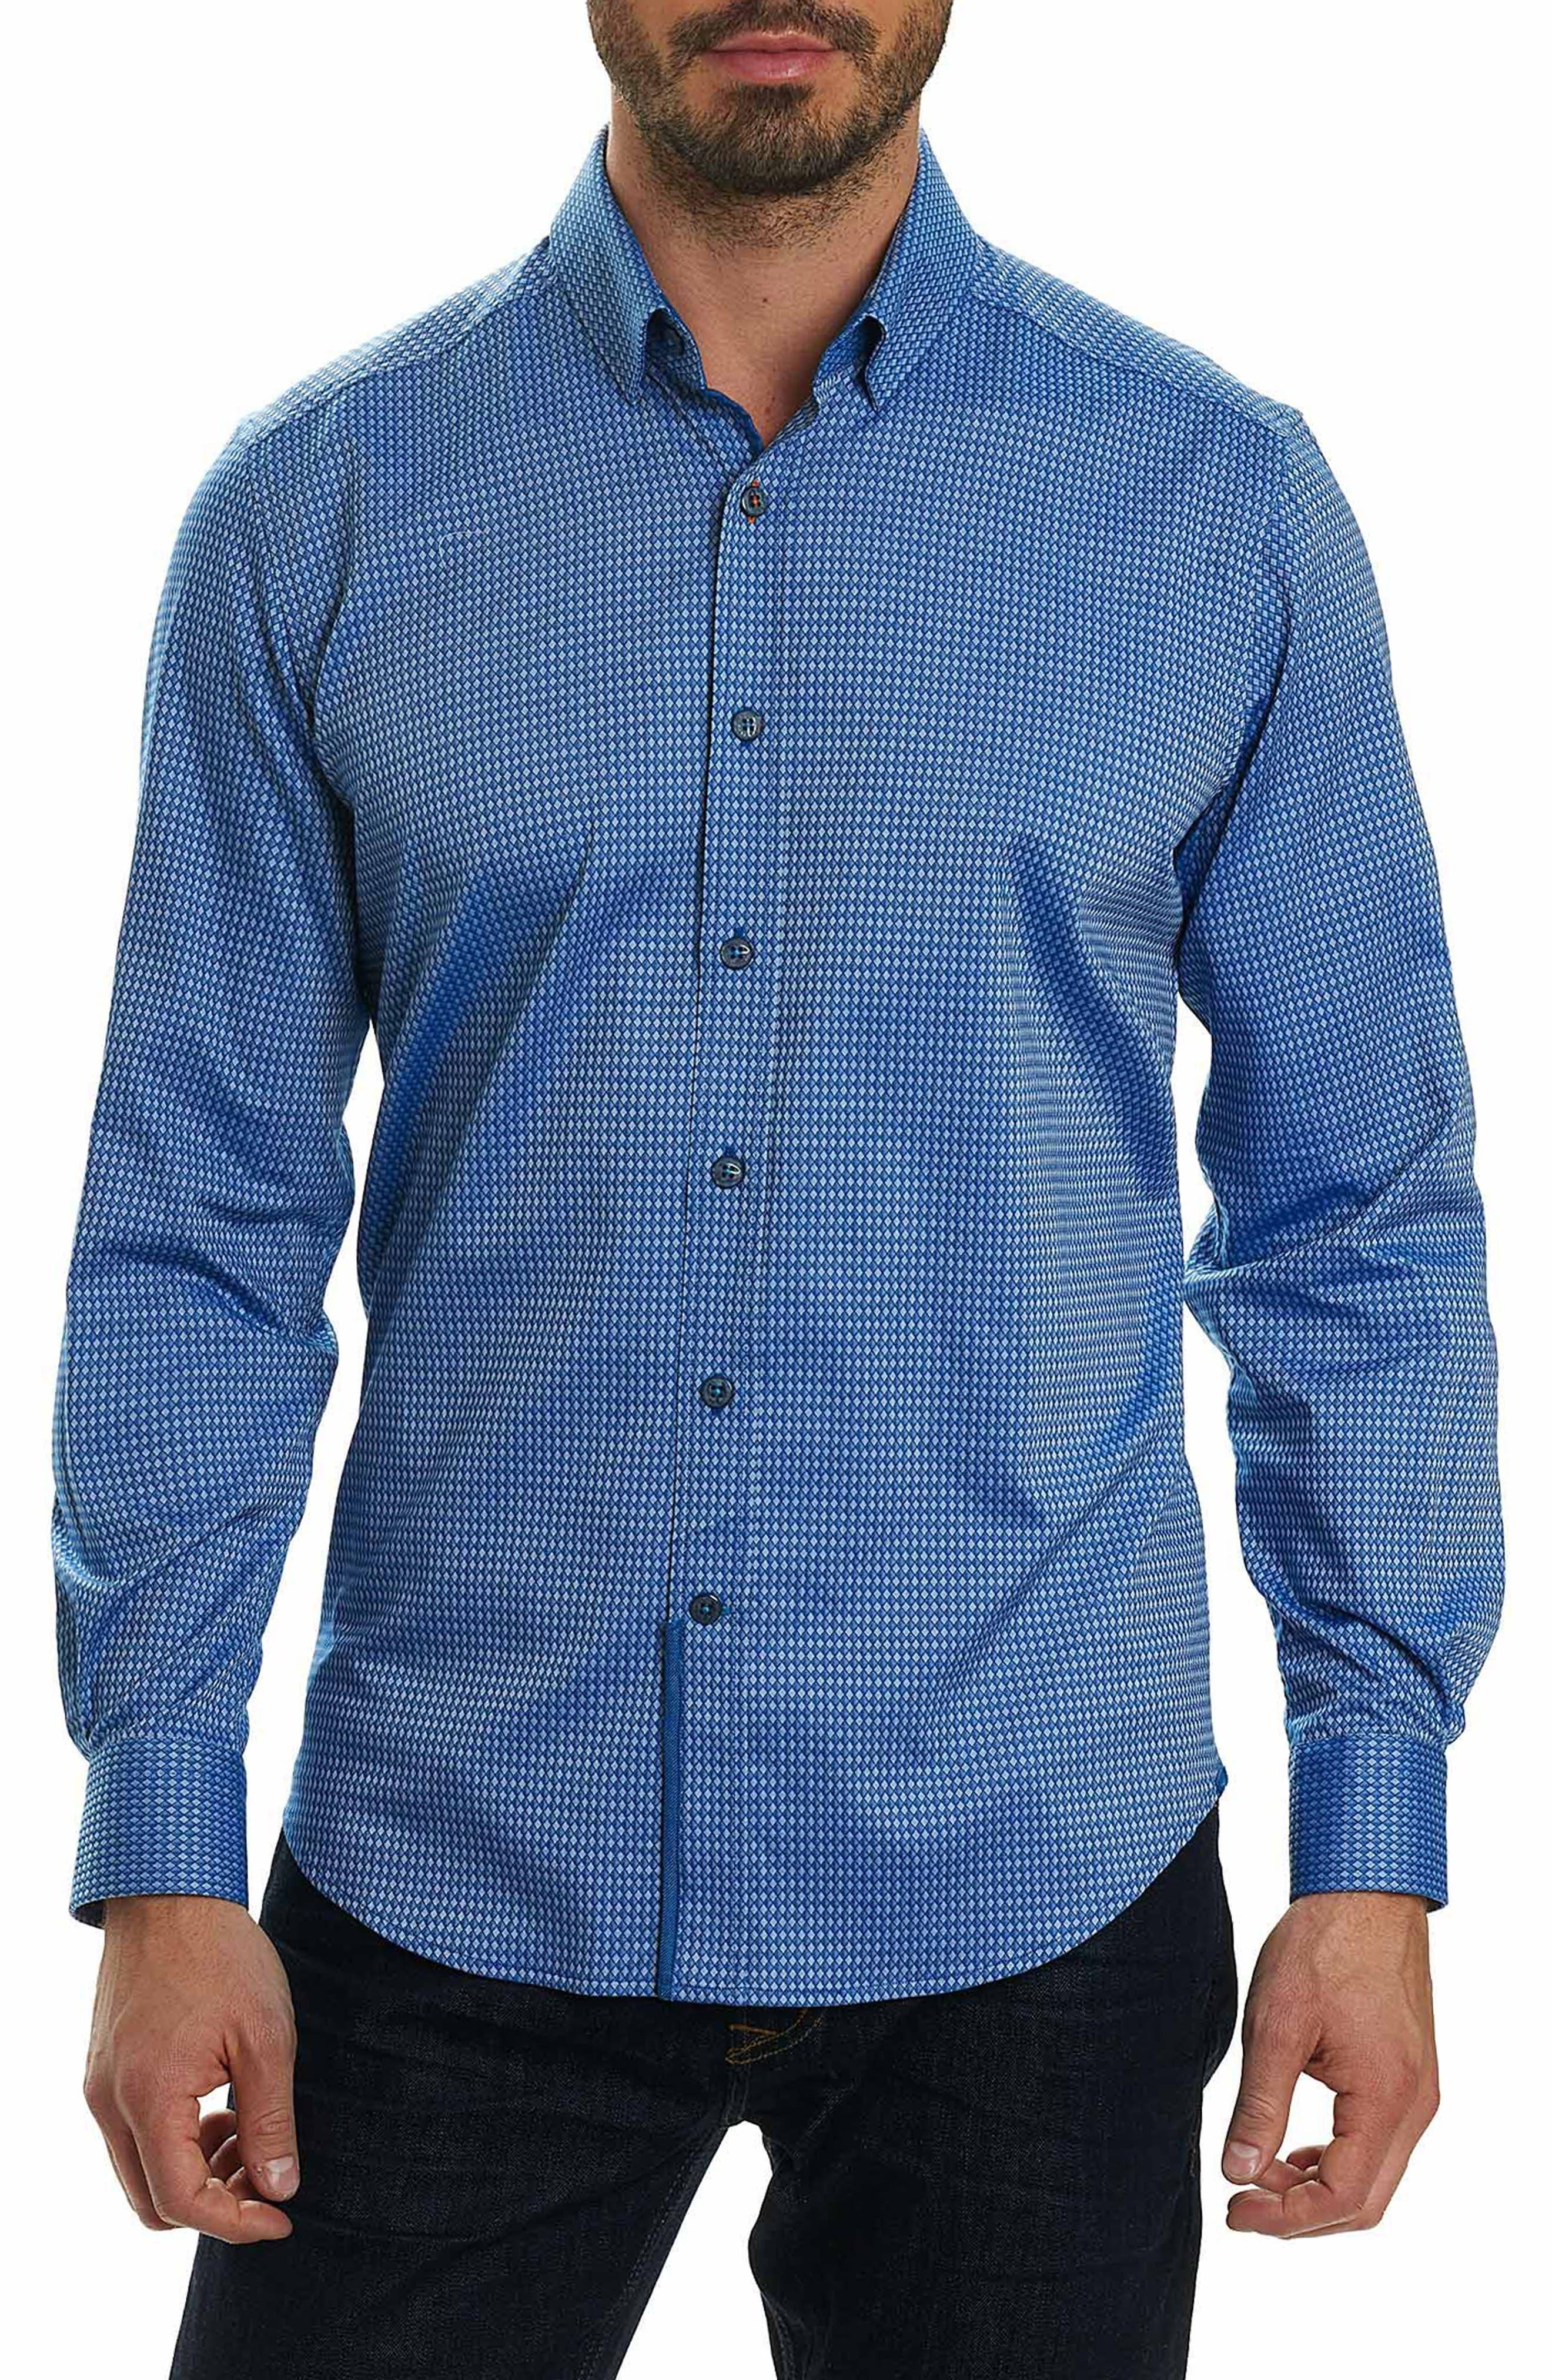 Matthew Tailored Fit Print Sport Shirt,                         Main,                         color, 410